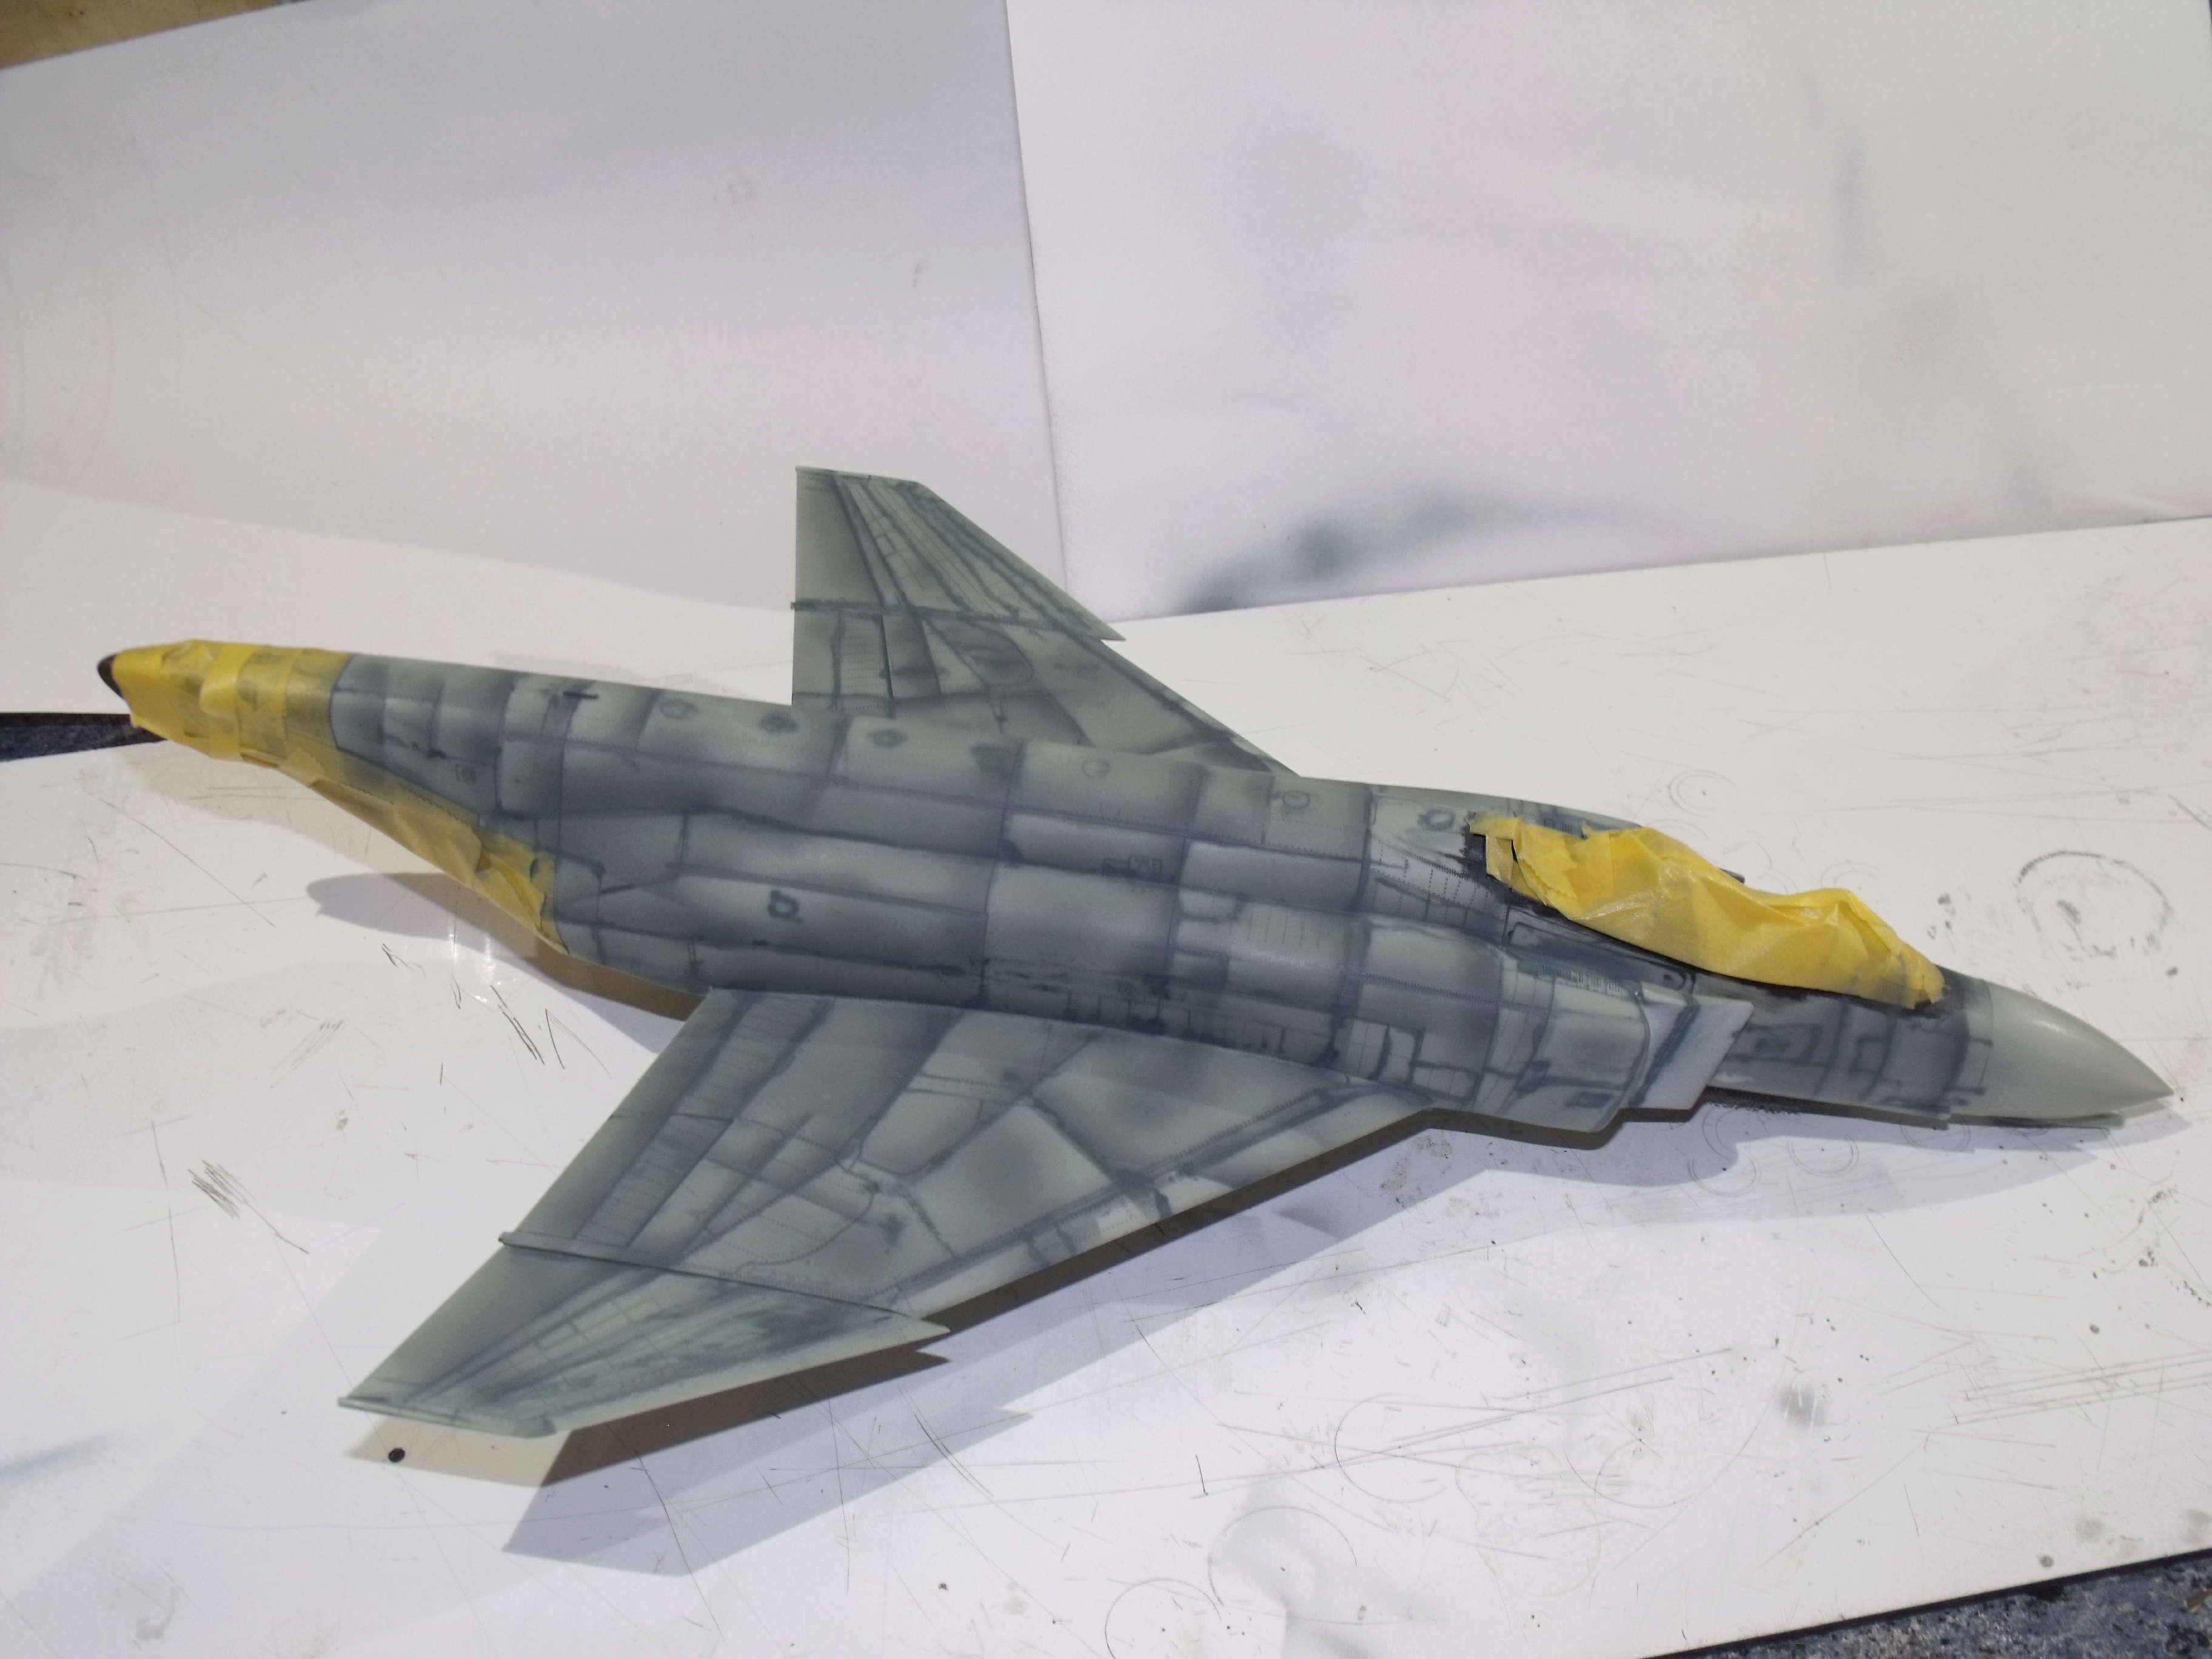 F-4 B Phantom 1/48° - VF-51 - 1972 - Début de patine. - Page 4 Dscf7035